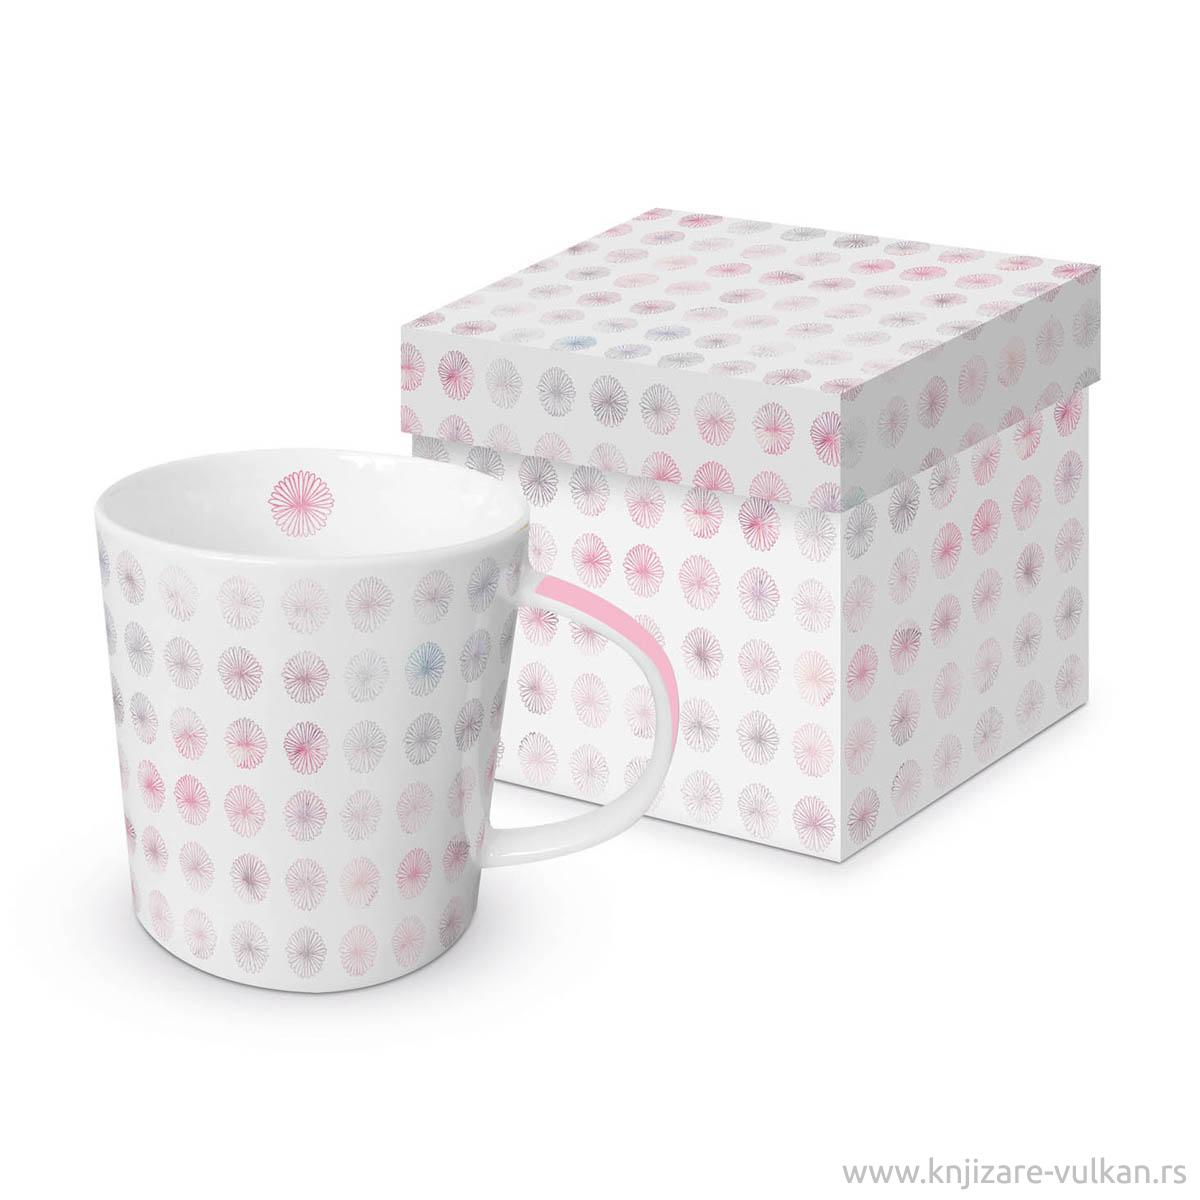 Šolja u poklon kutiji MINIMAL FLOWERS ROSE